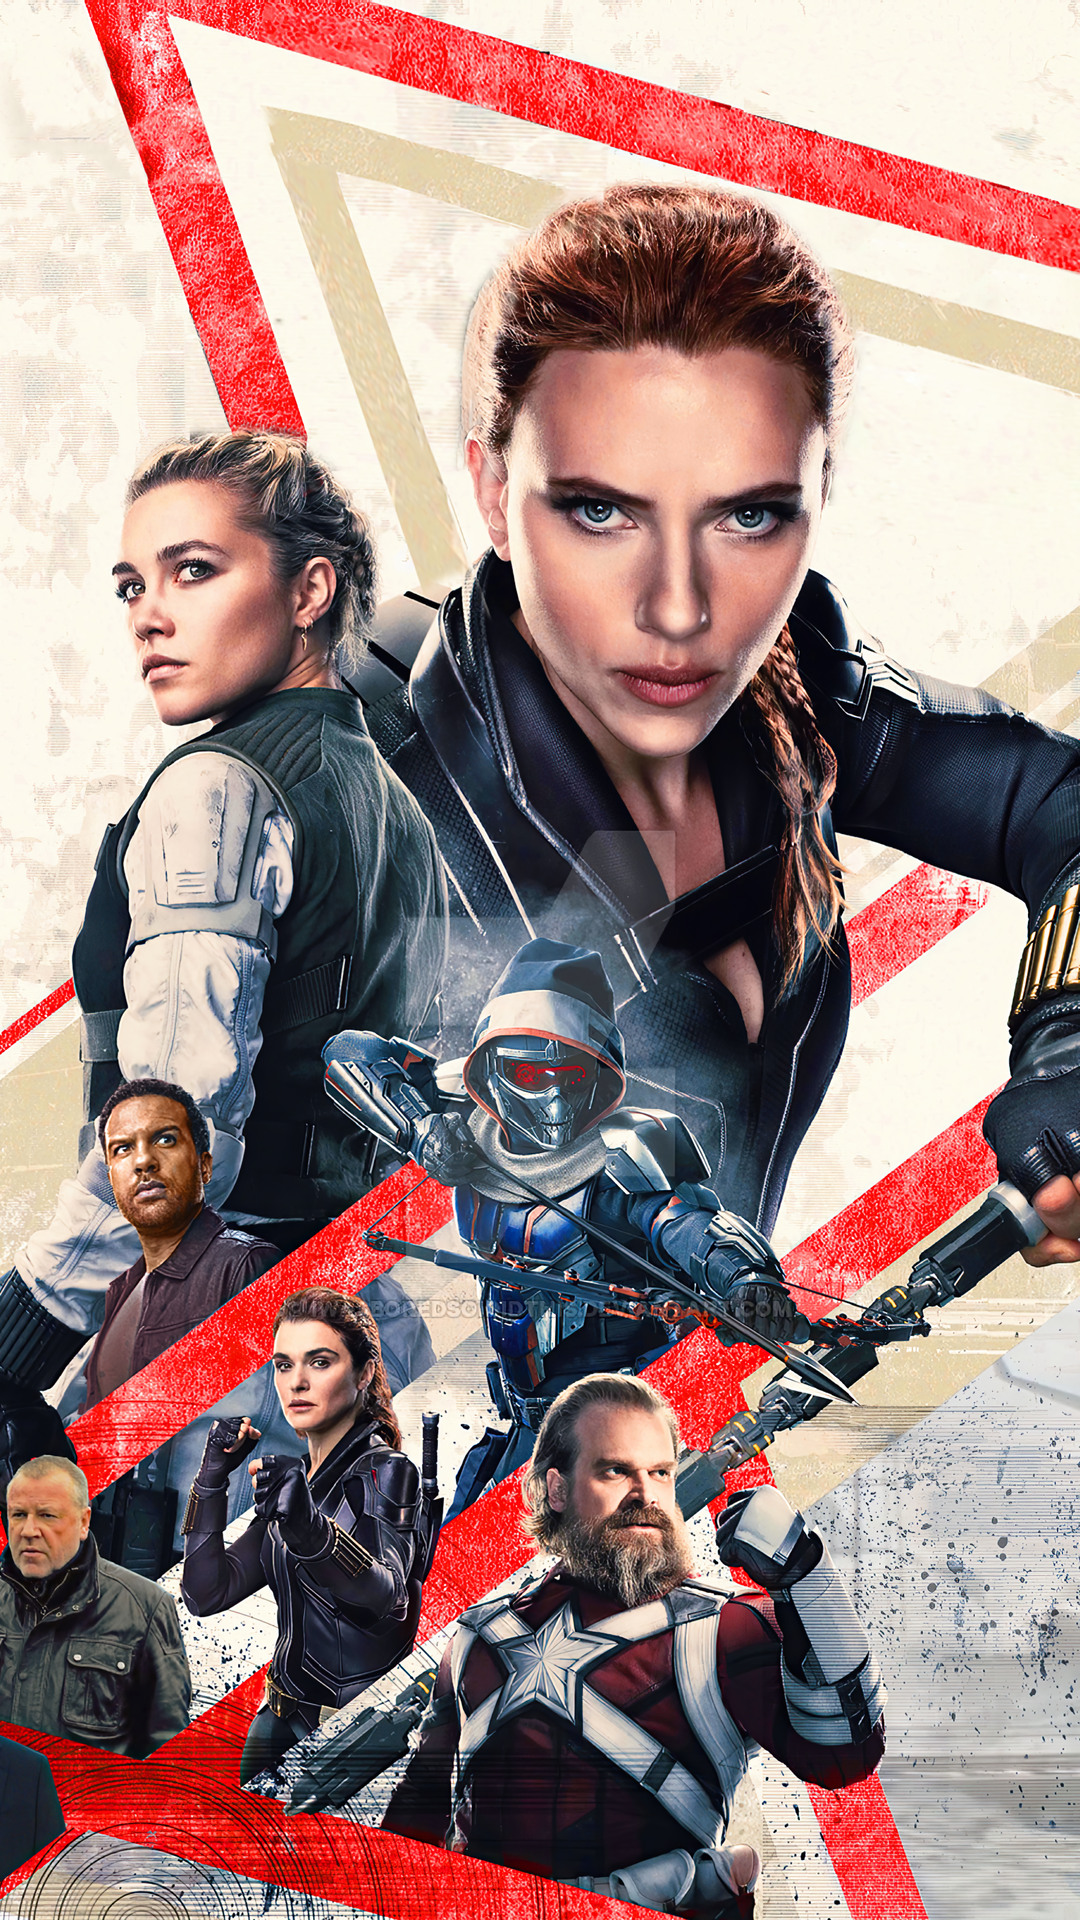 Black Widow 2021 Movie Poster HD 4K Wallpaper 82260 1080x1920